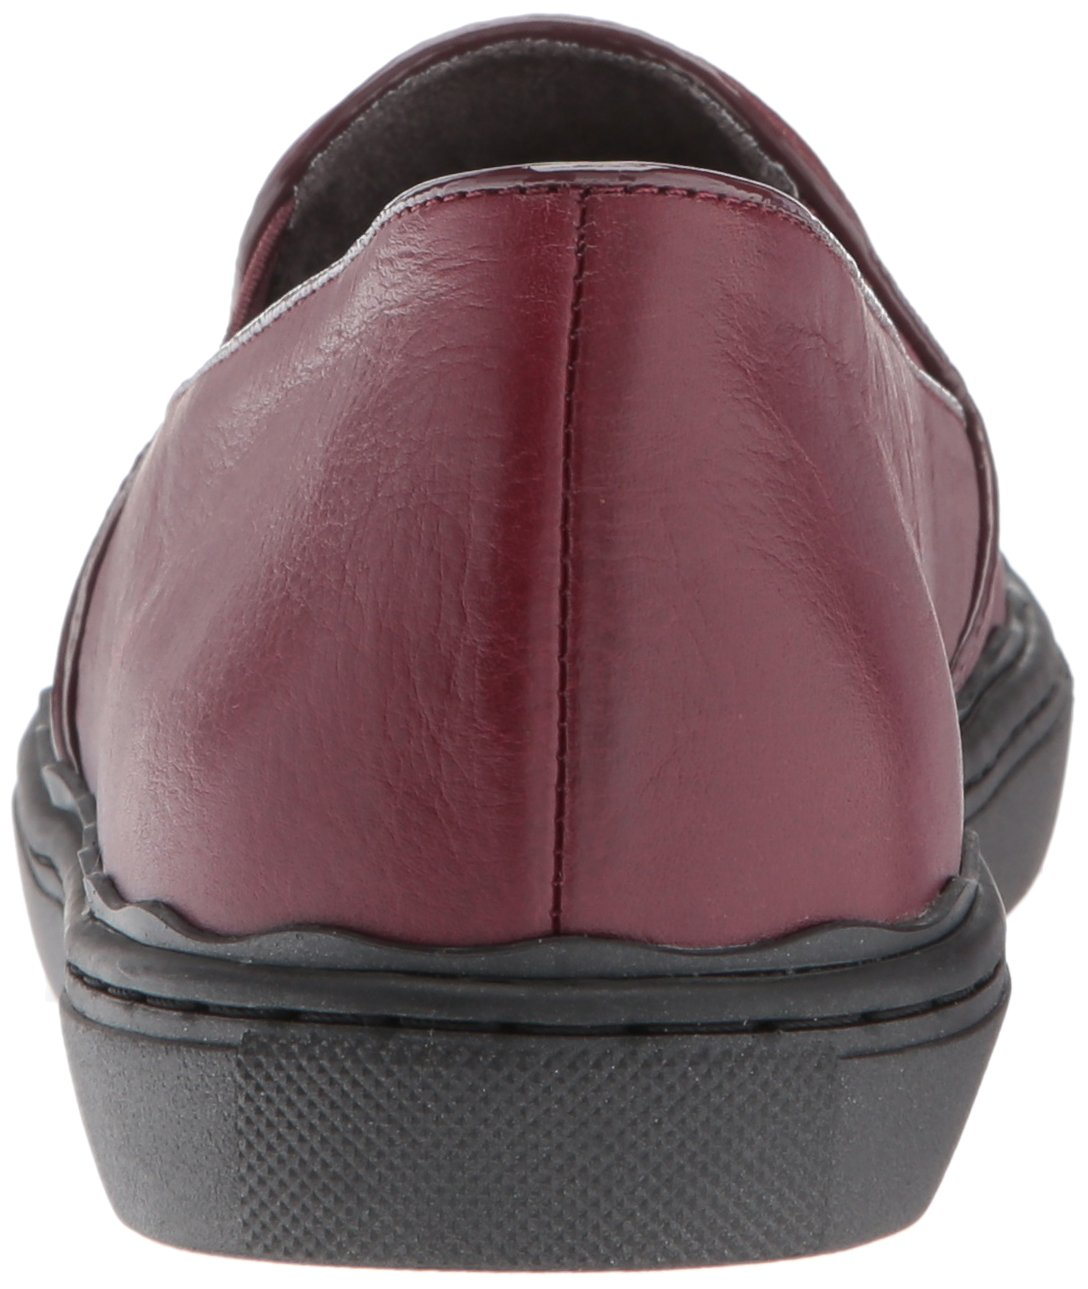 Aerosoles 7 Women's Millionaire Flat B072FPRRT2 7 Aerosoles B(M) US Wine Leather f25fd0